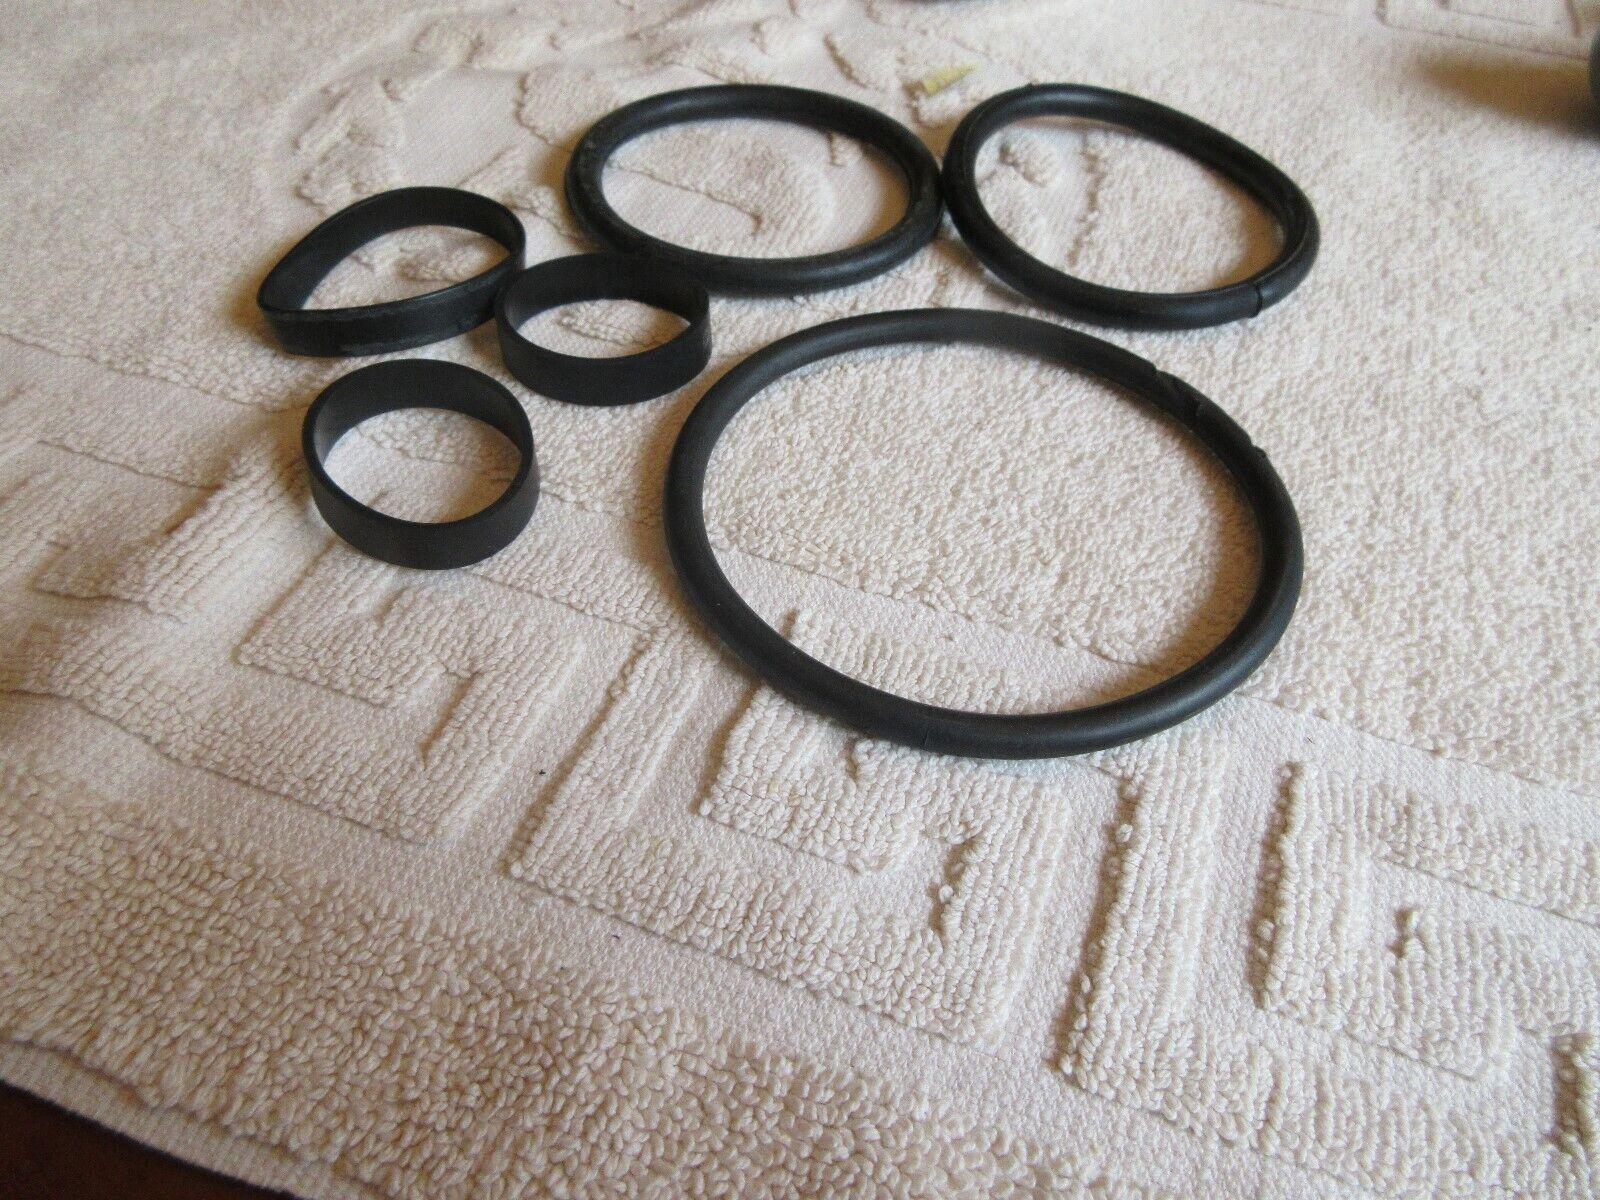 Hoover , Eureka , Vacuum Cleaner Fan Belts , Lot of 6 M